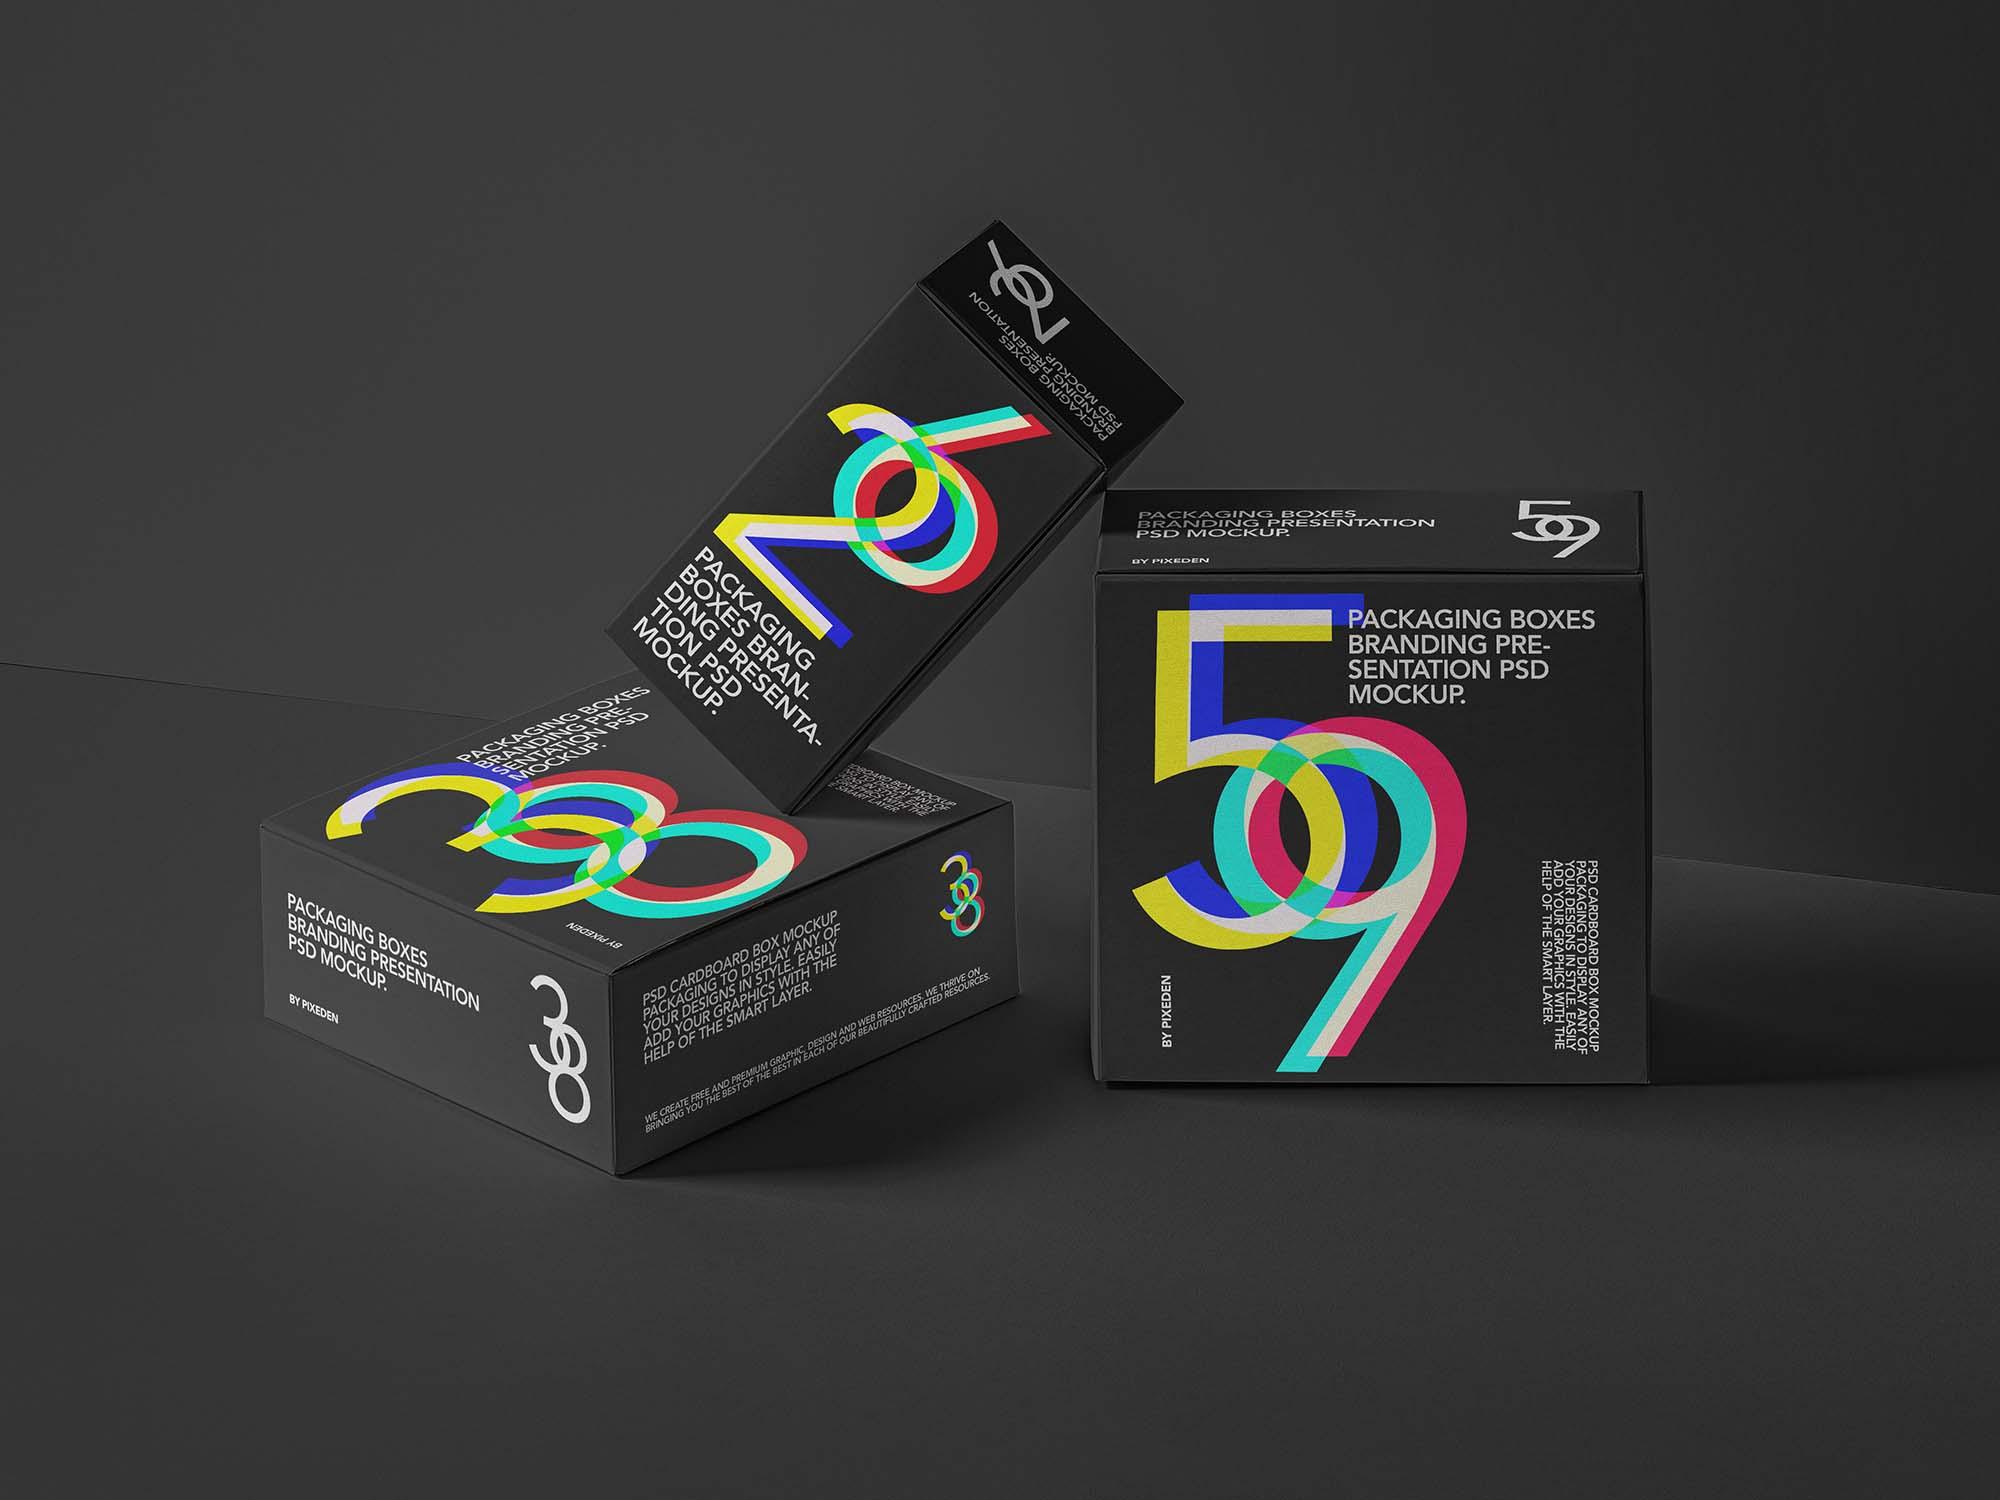 Packaging Boxes Mockup 2